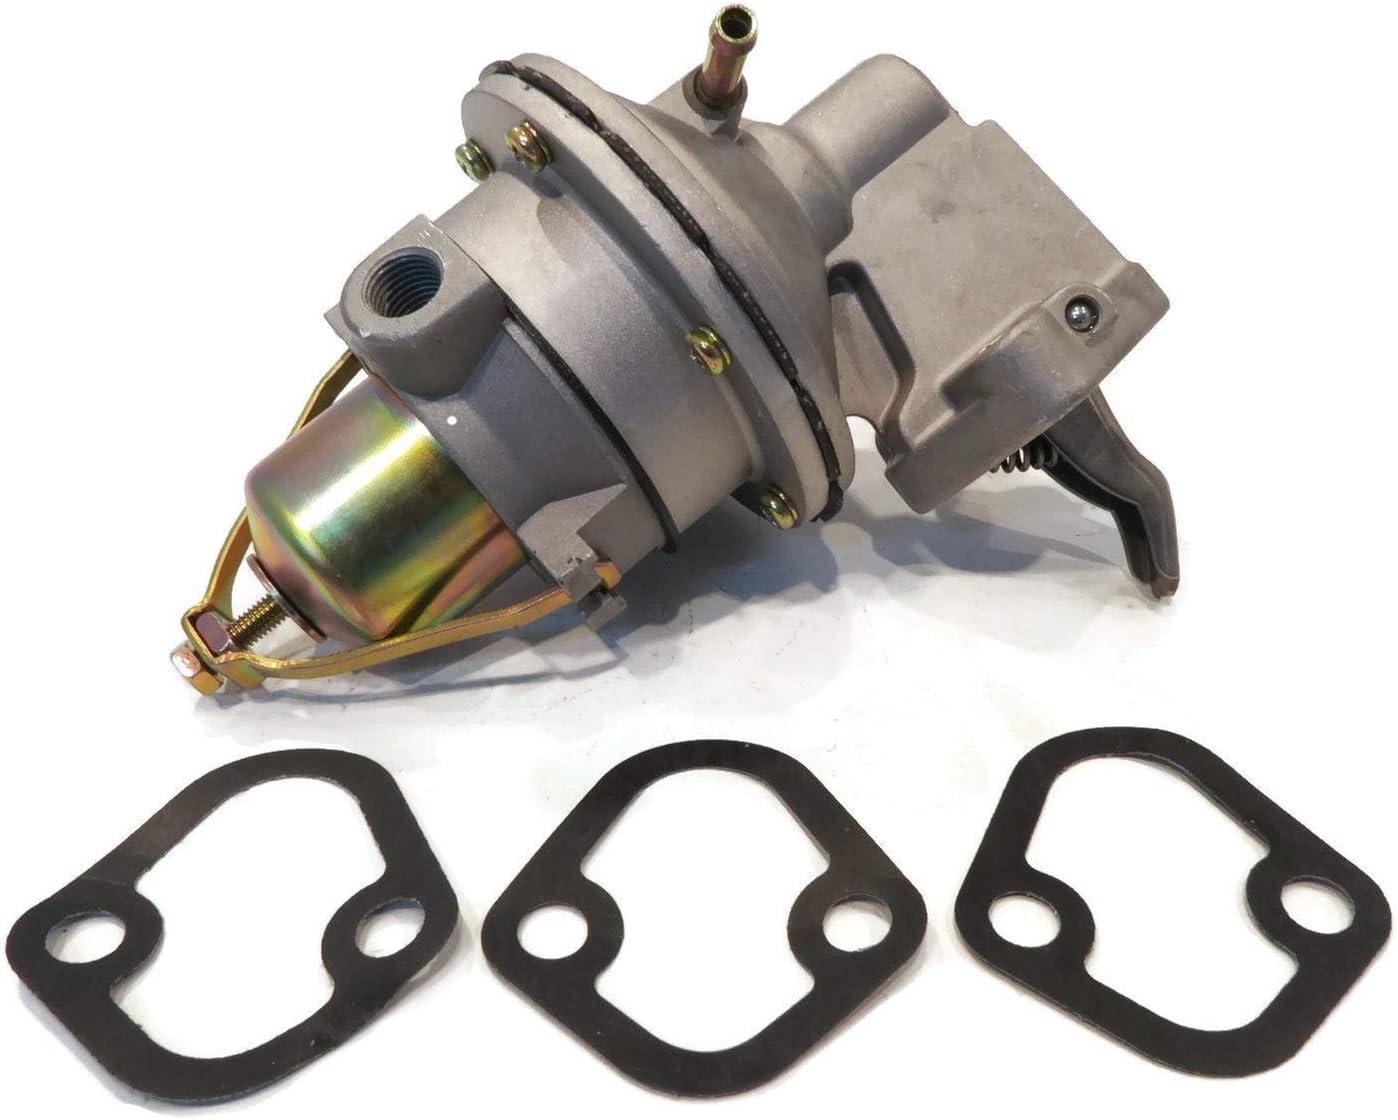 The ROP Shop Fuel Pump fits Mercury MerCruiser 1989 140HP 3.0L GM 0B450801 0C856558 Engines